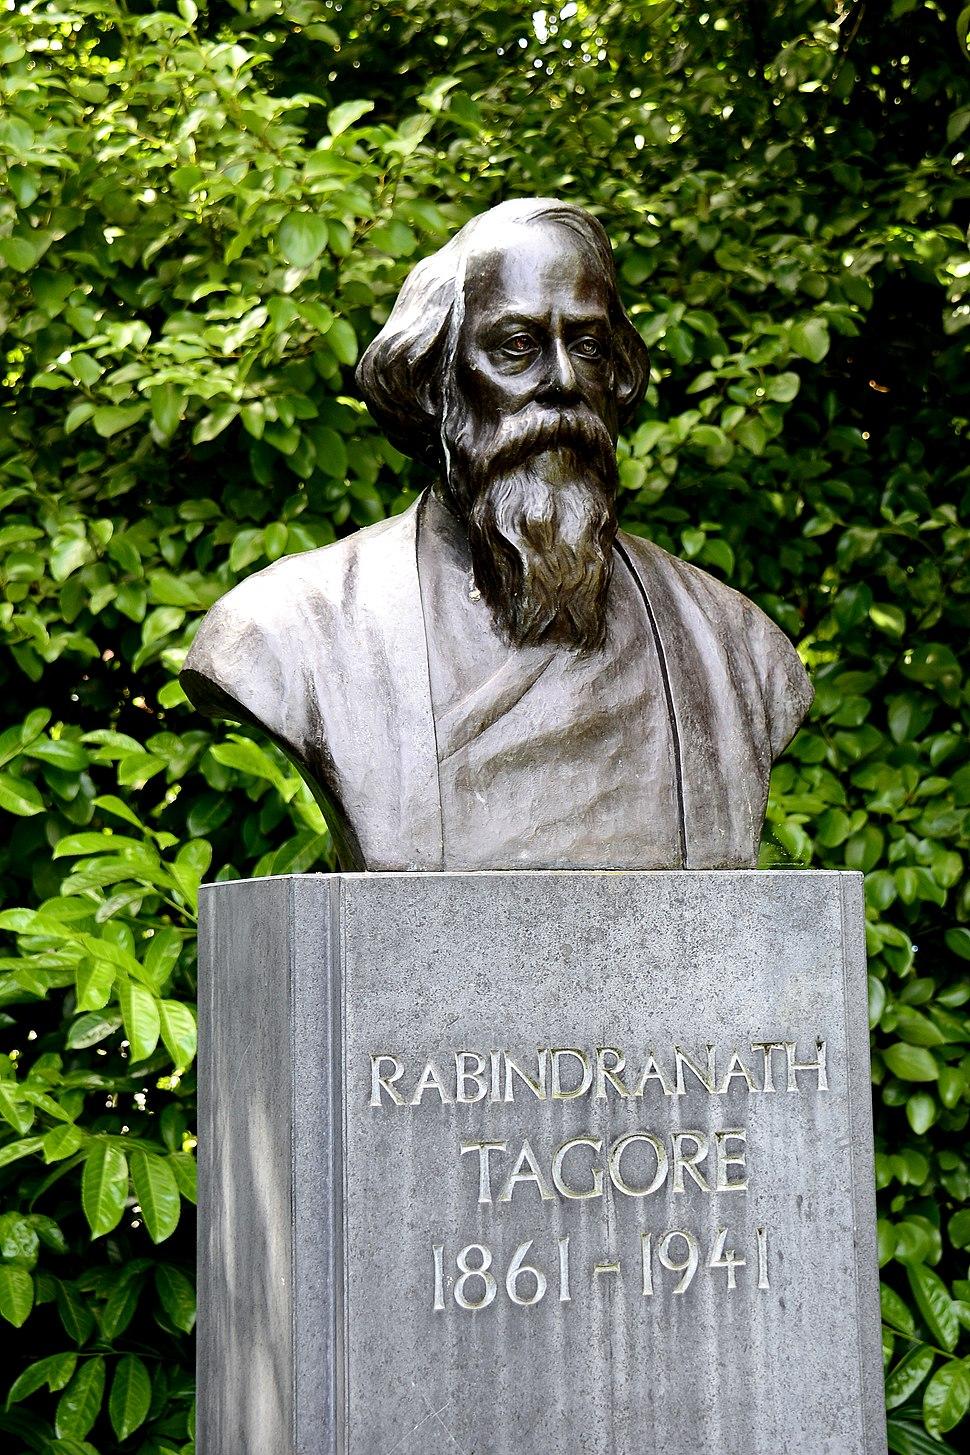 Rabindranath Tagore's bust at St Stephen Green Park, Dublin, Ireland